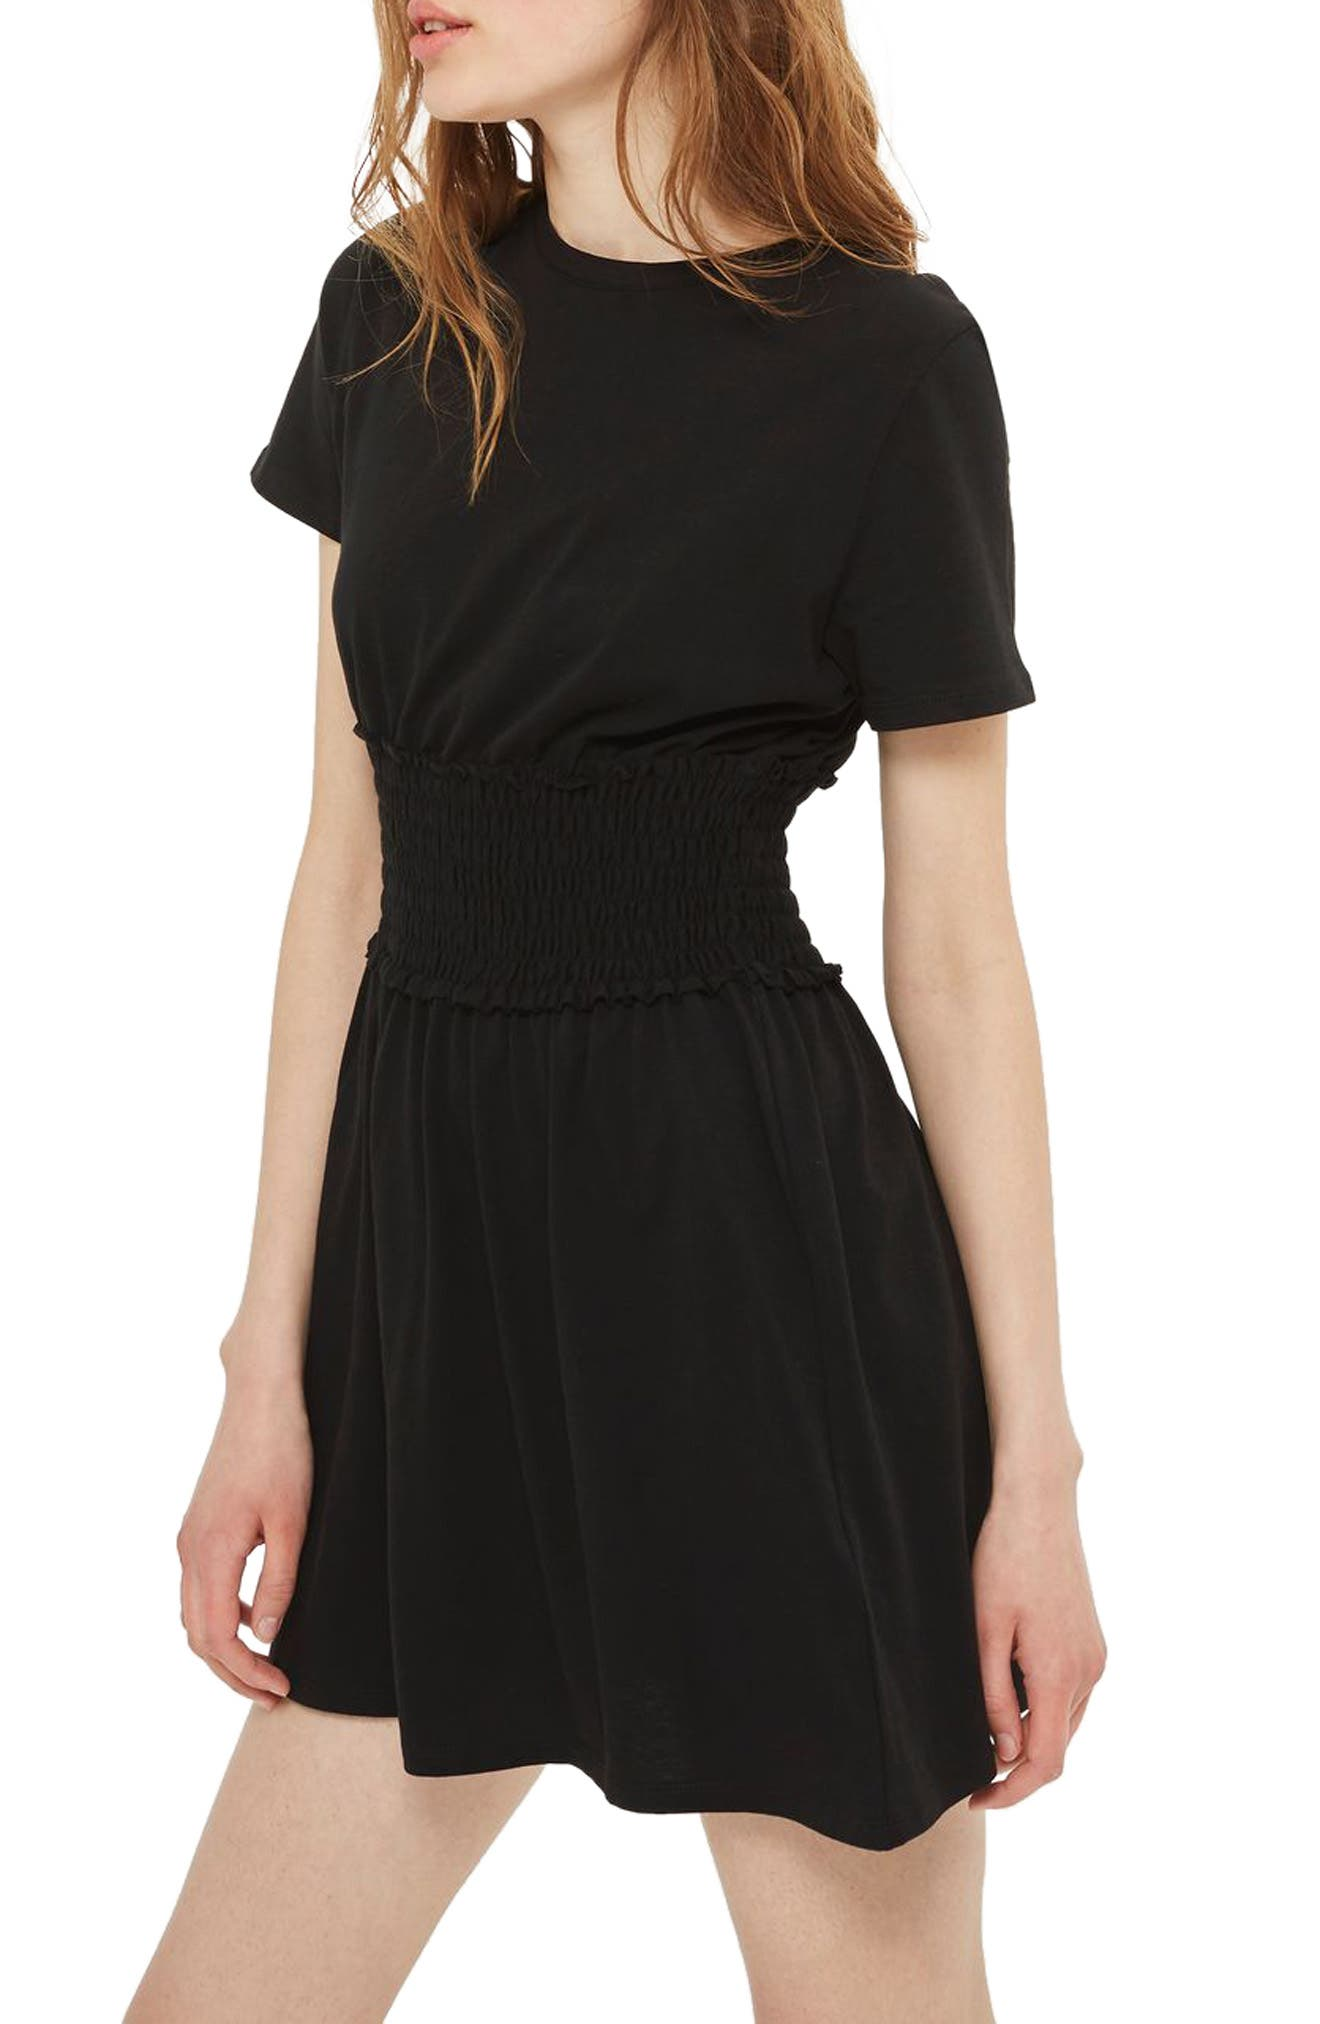 Topshop Smocked Corset T-Shirt Dress